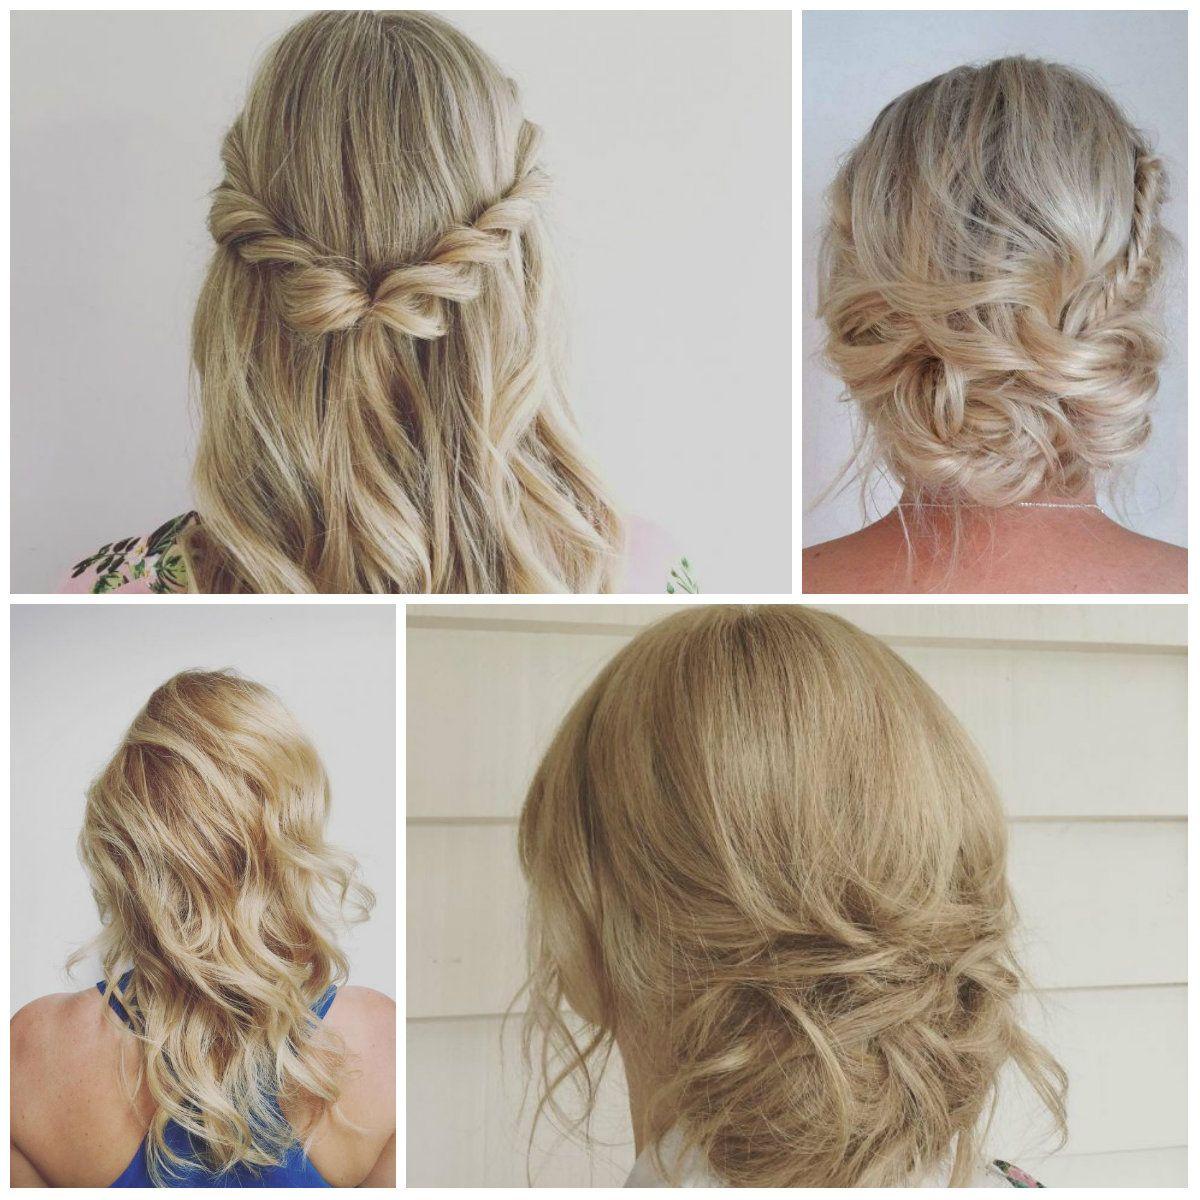 Blondehairstyles neue trend haar modelle pinterest